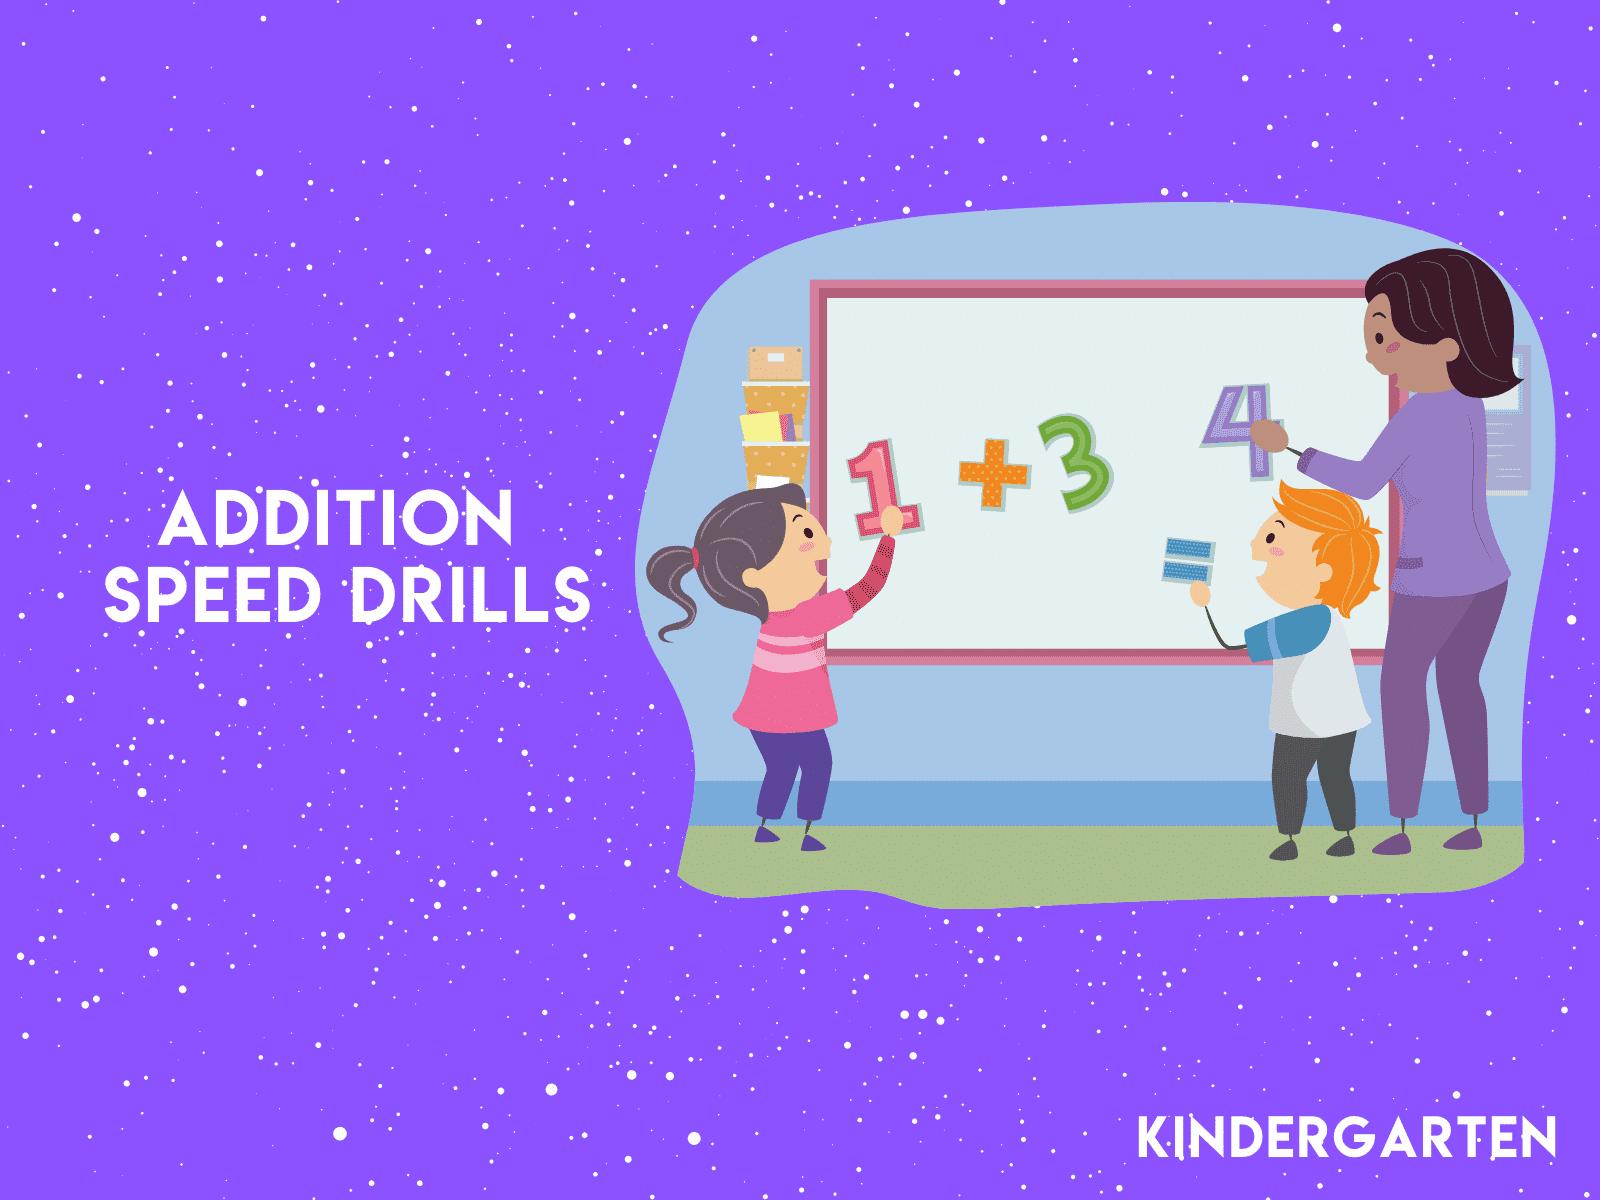 Practice math facts fluency with free kindergarten addition speed drills.